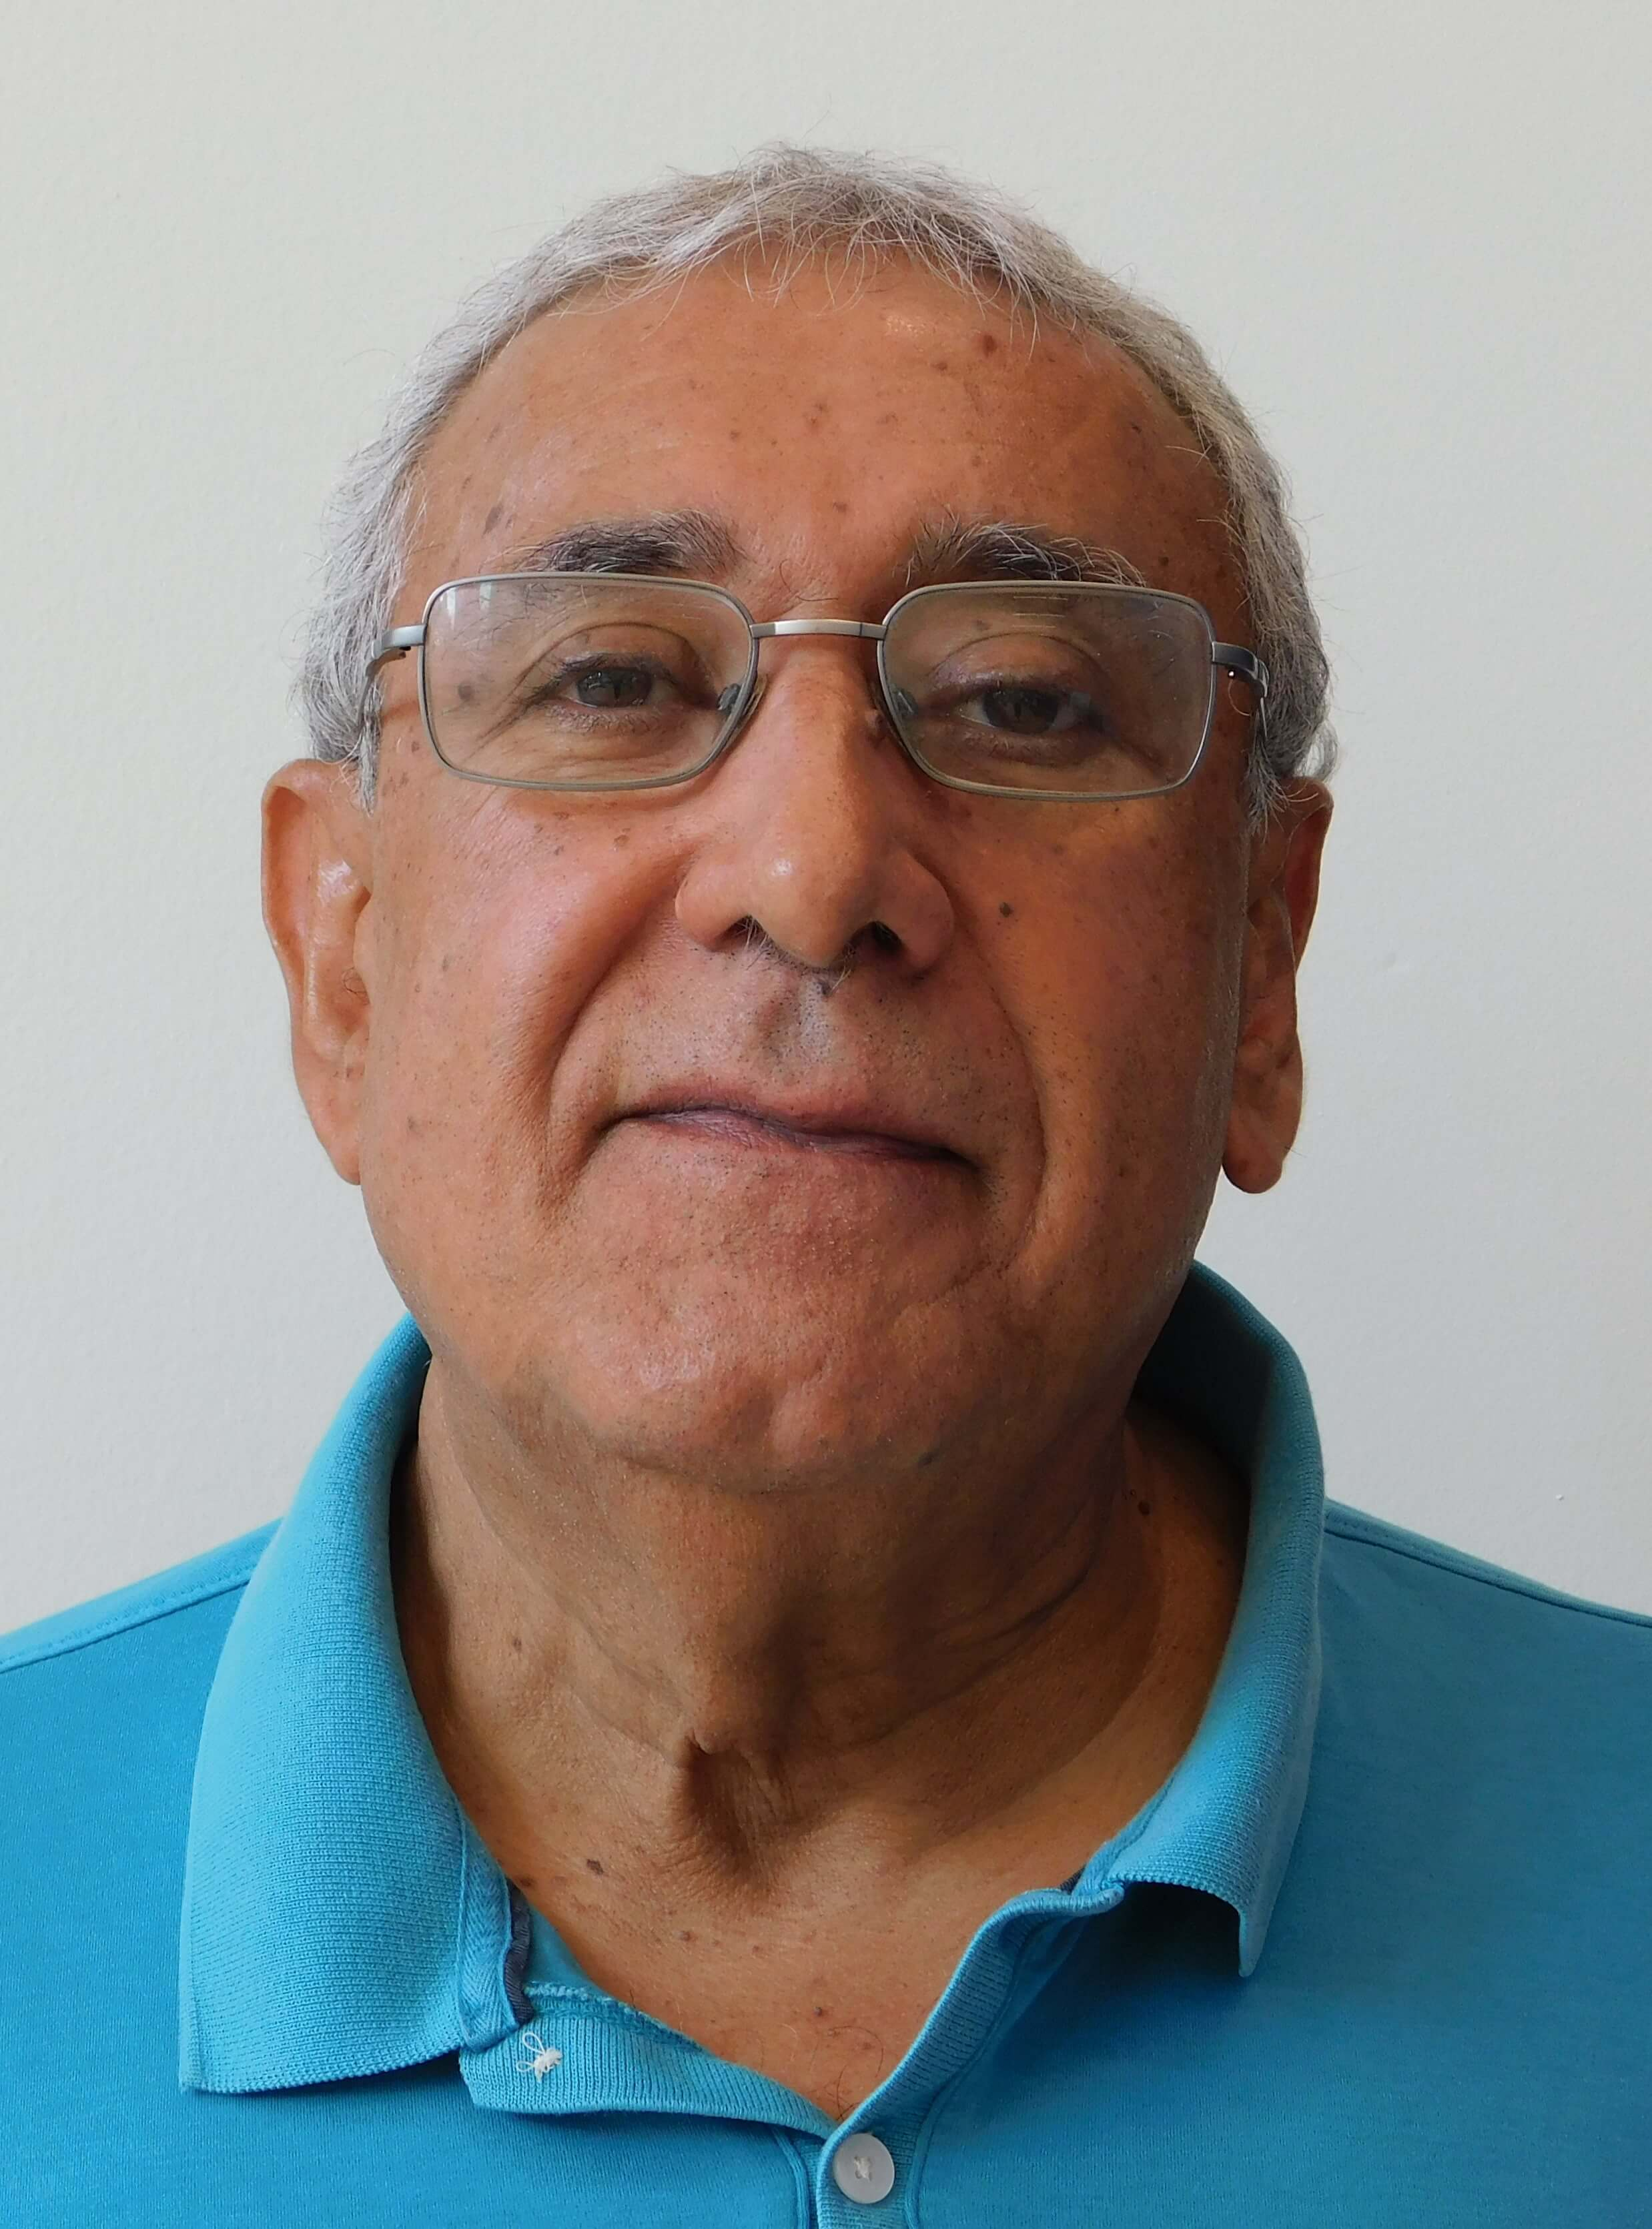 Photo of Bahman Khosravi, Ph.D.